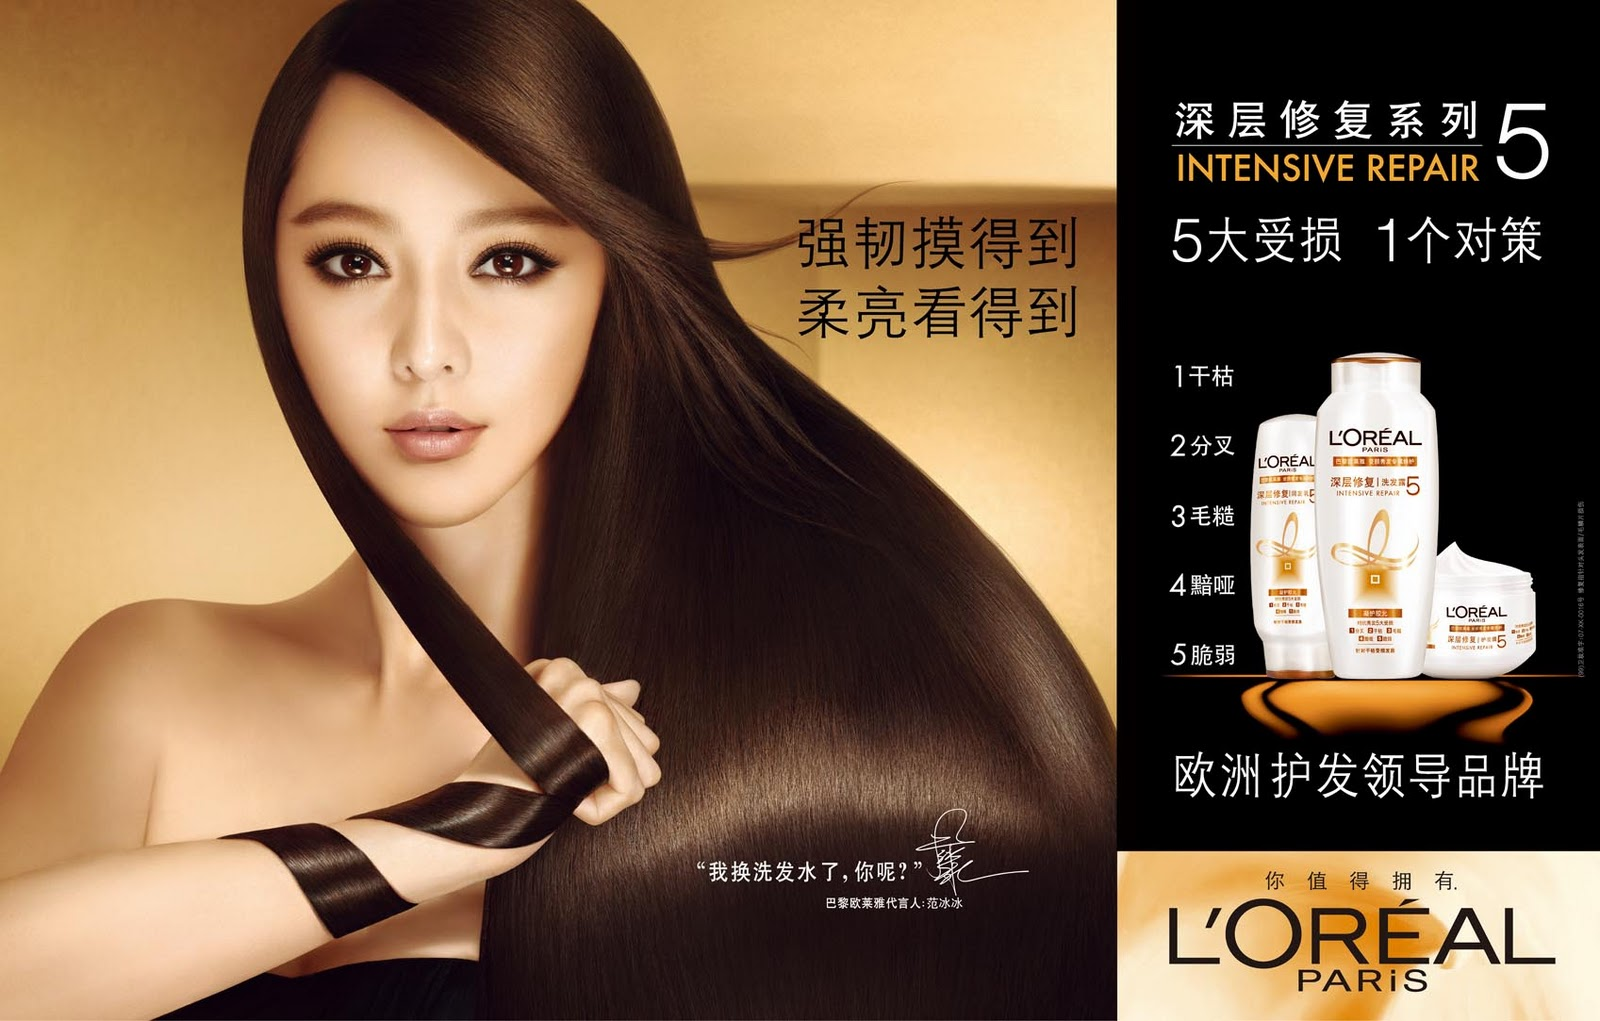 Loreal ads